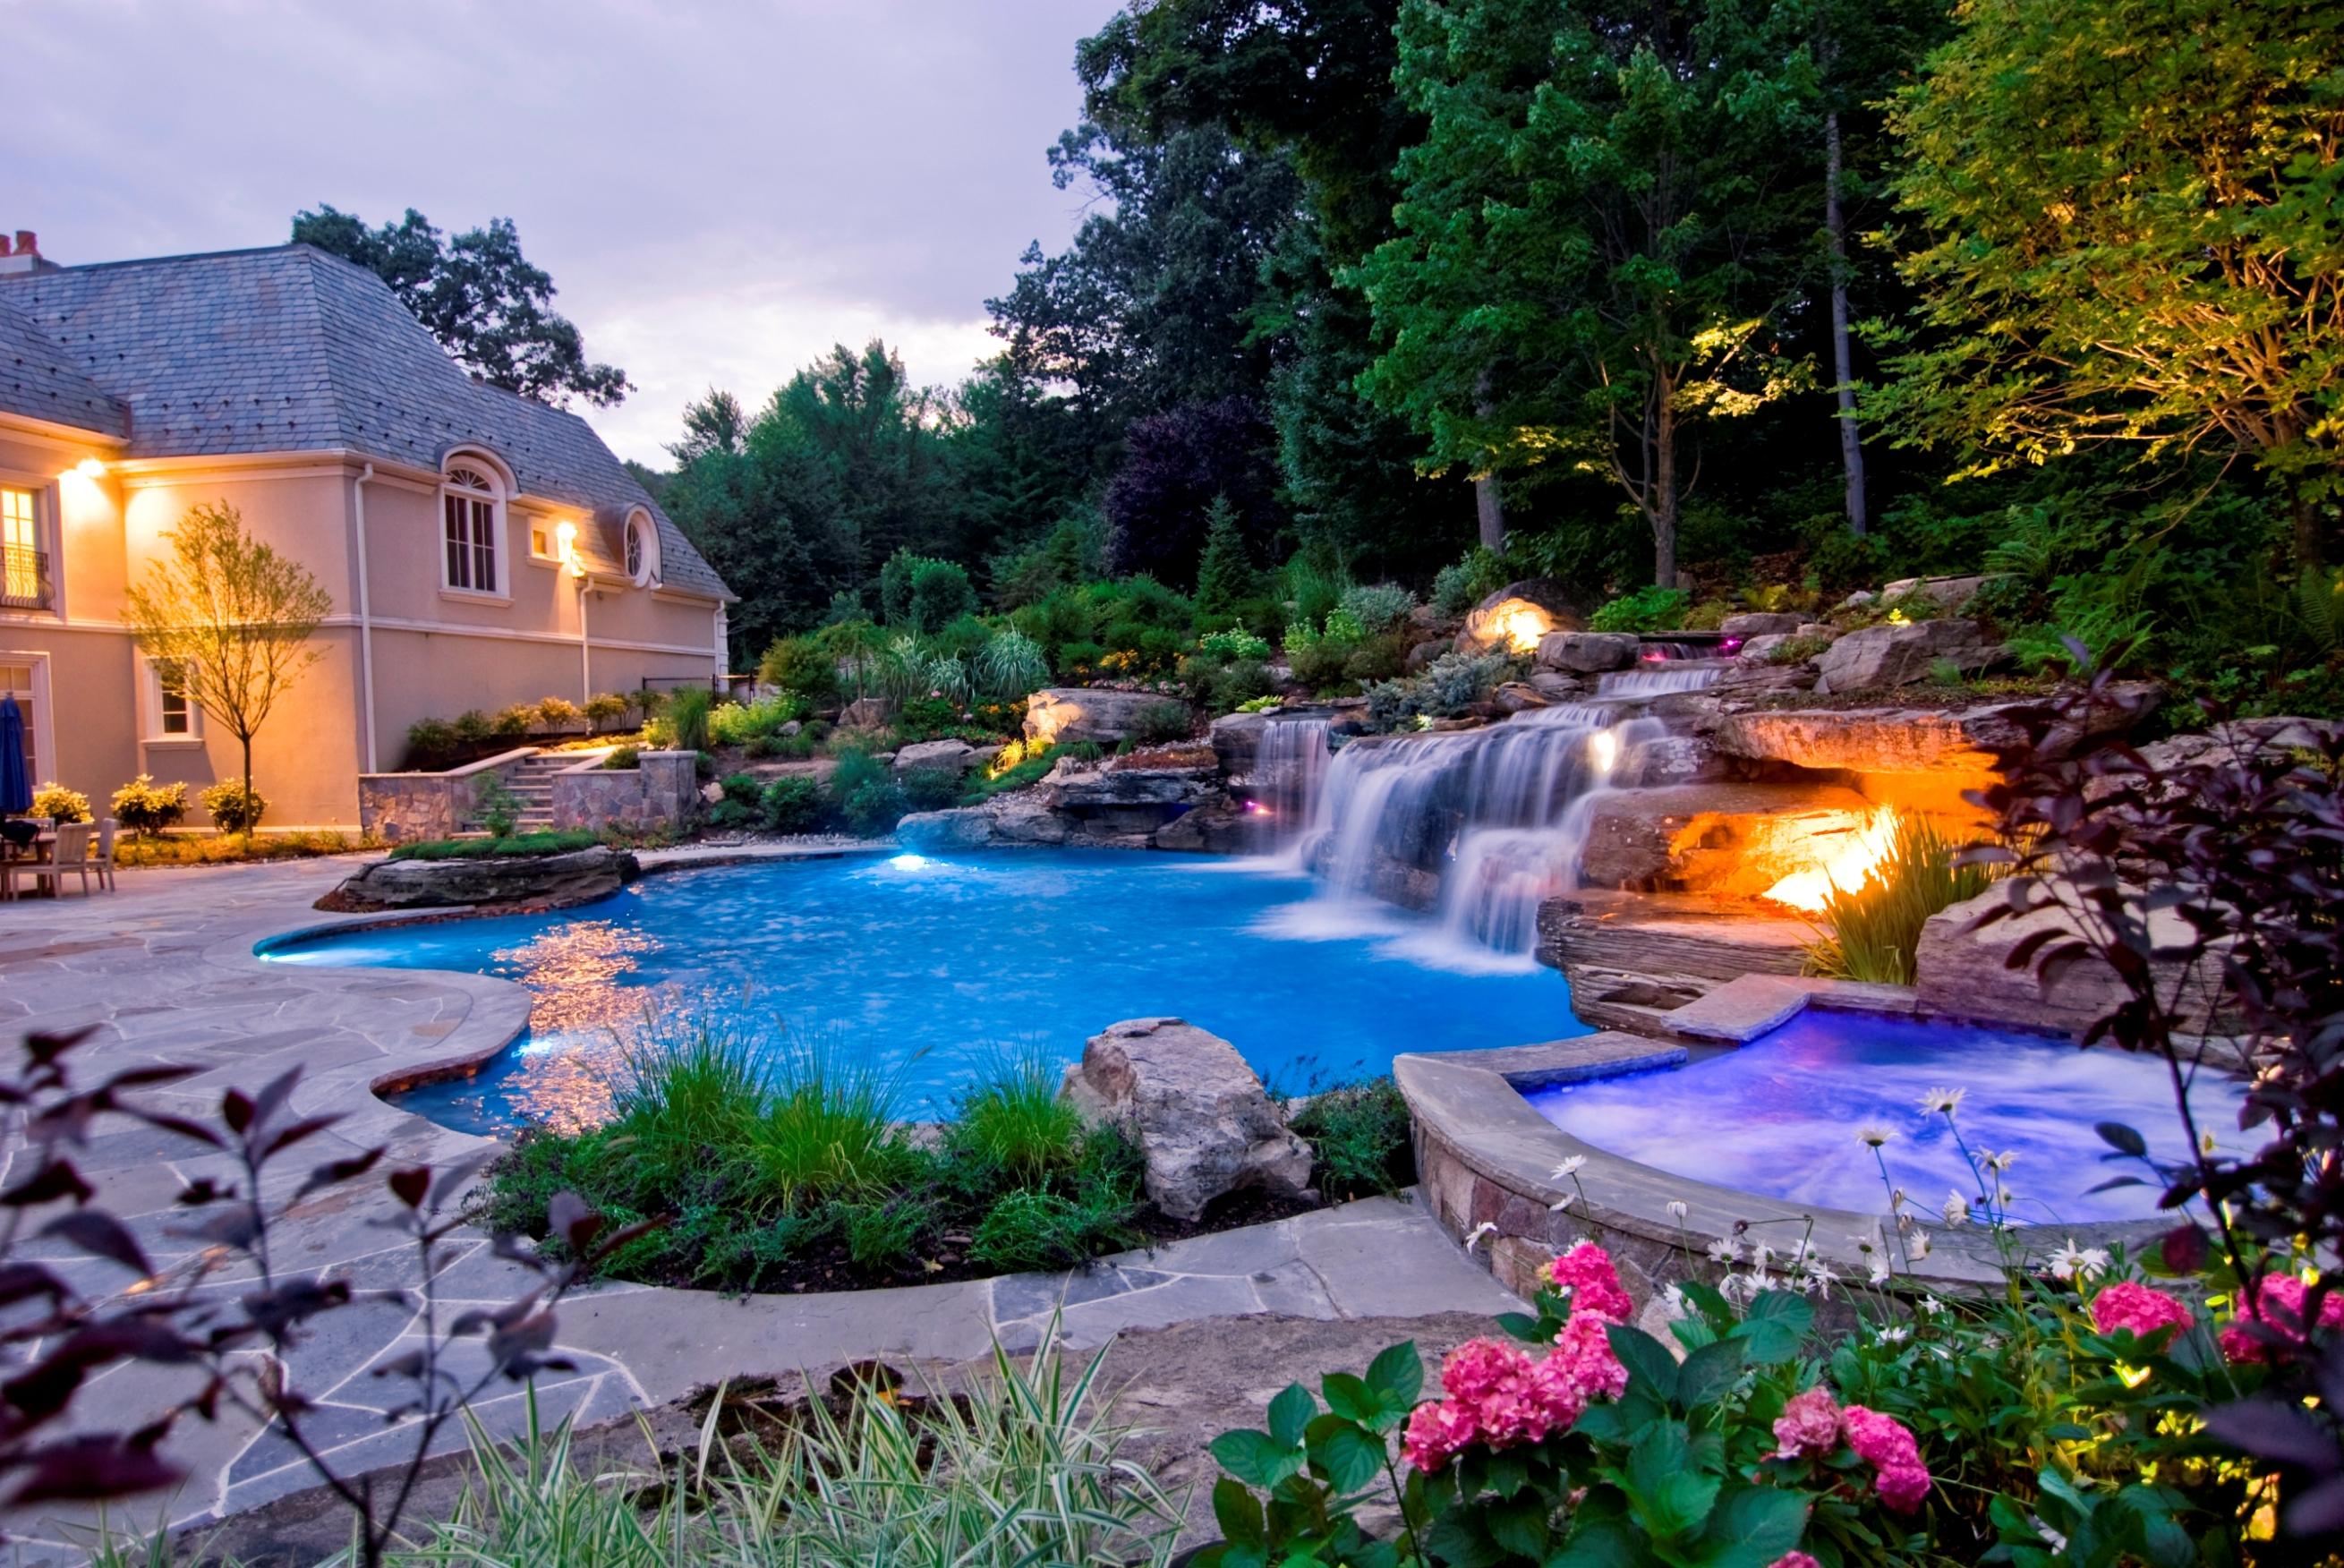 New Jersey Pool Renovation Company Earns International ... on Backyard Renovation Companies id=30272